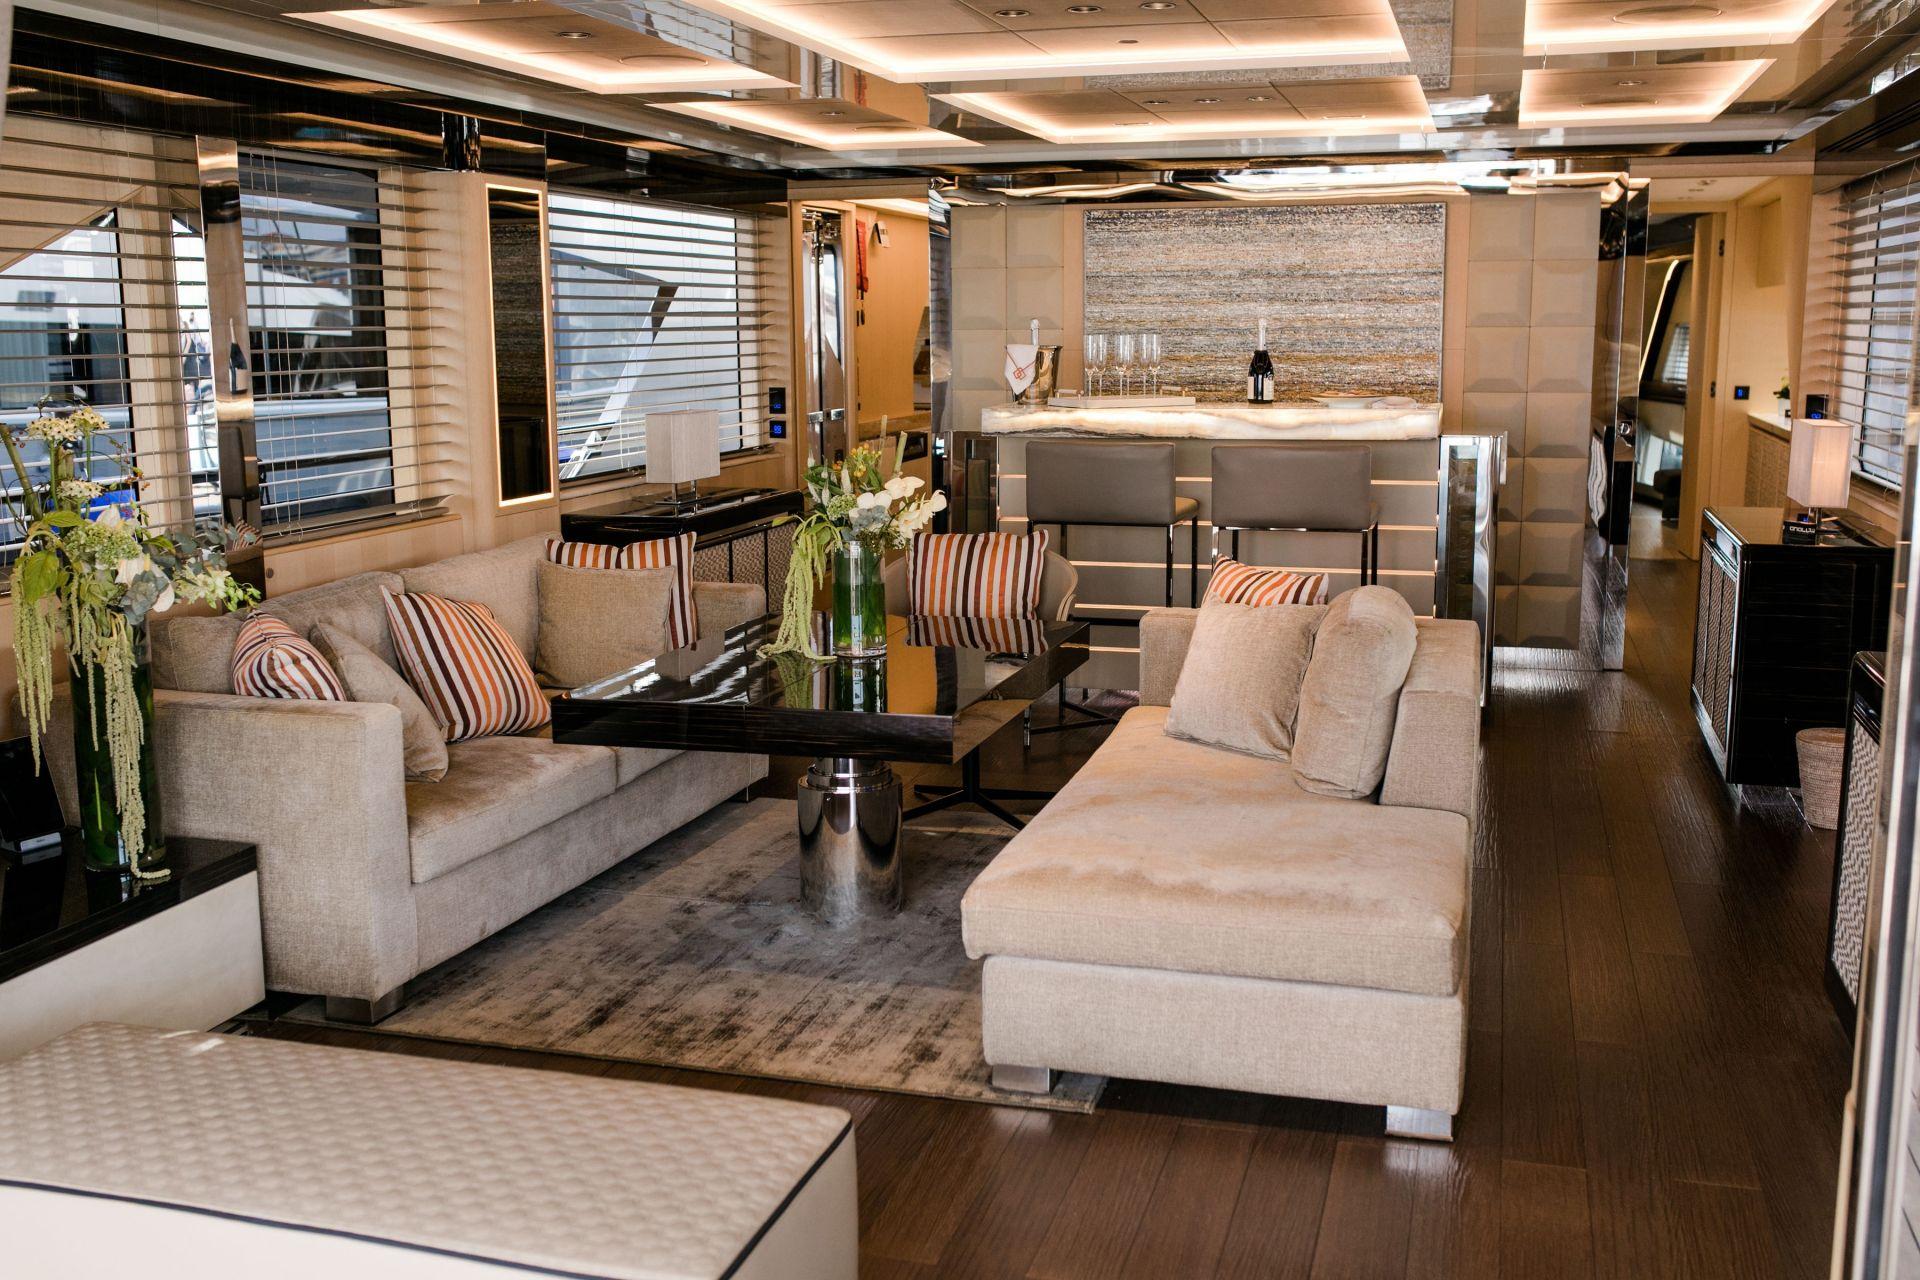 M/Y HANAA yacht for charter living room